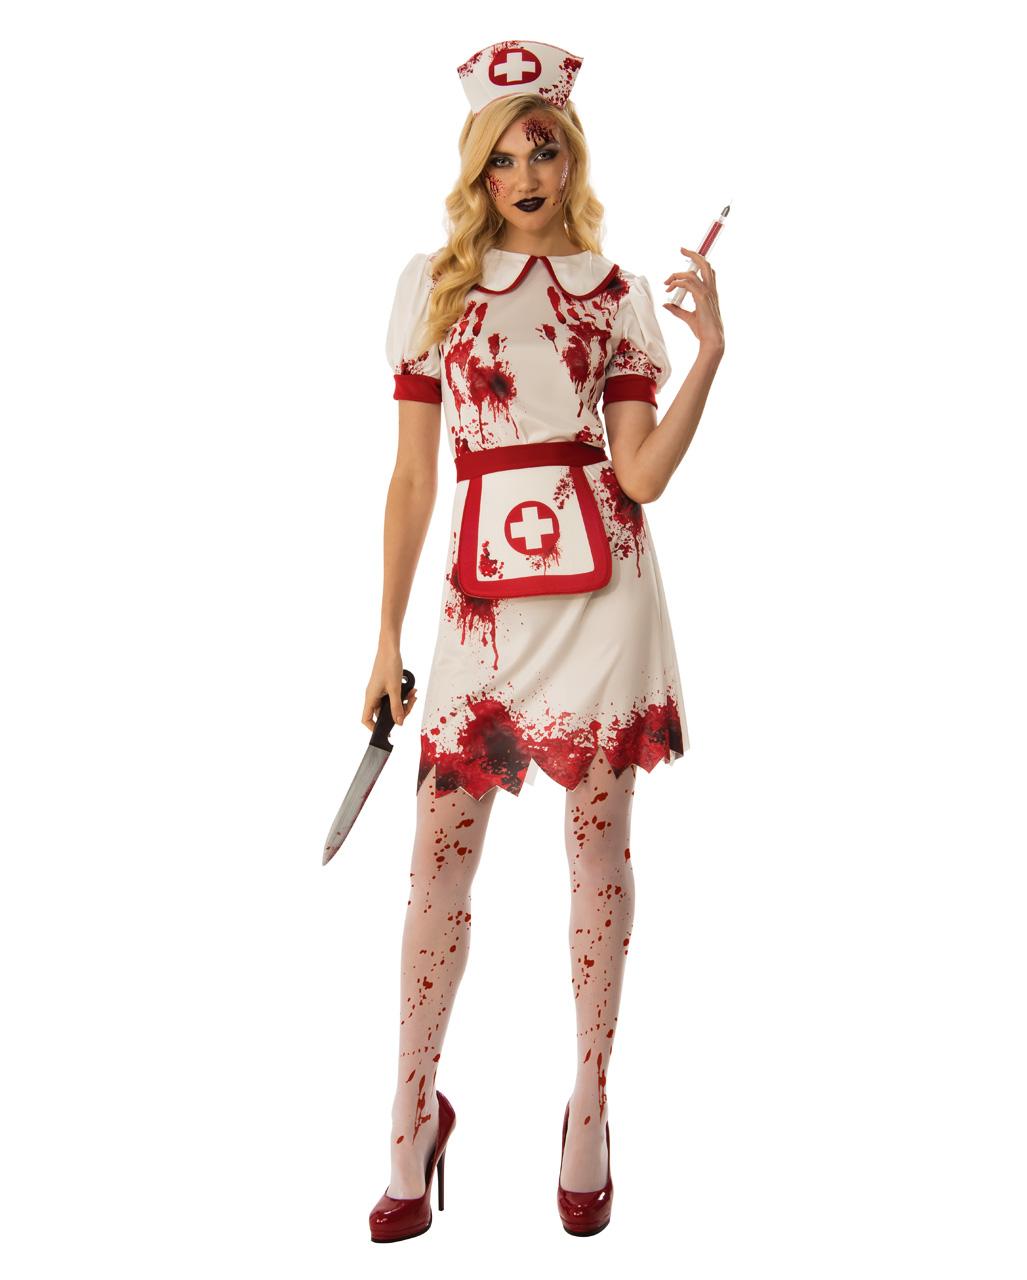 horror-nurse-the-costumes-halloween-costume-ladies-for-adult-bloody-nurse-costume